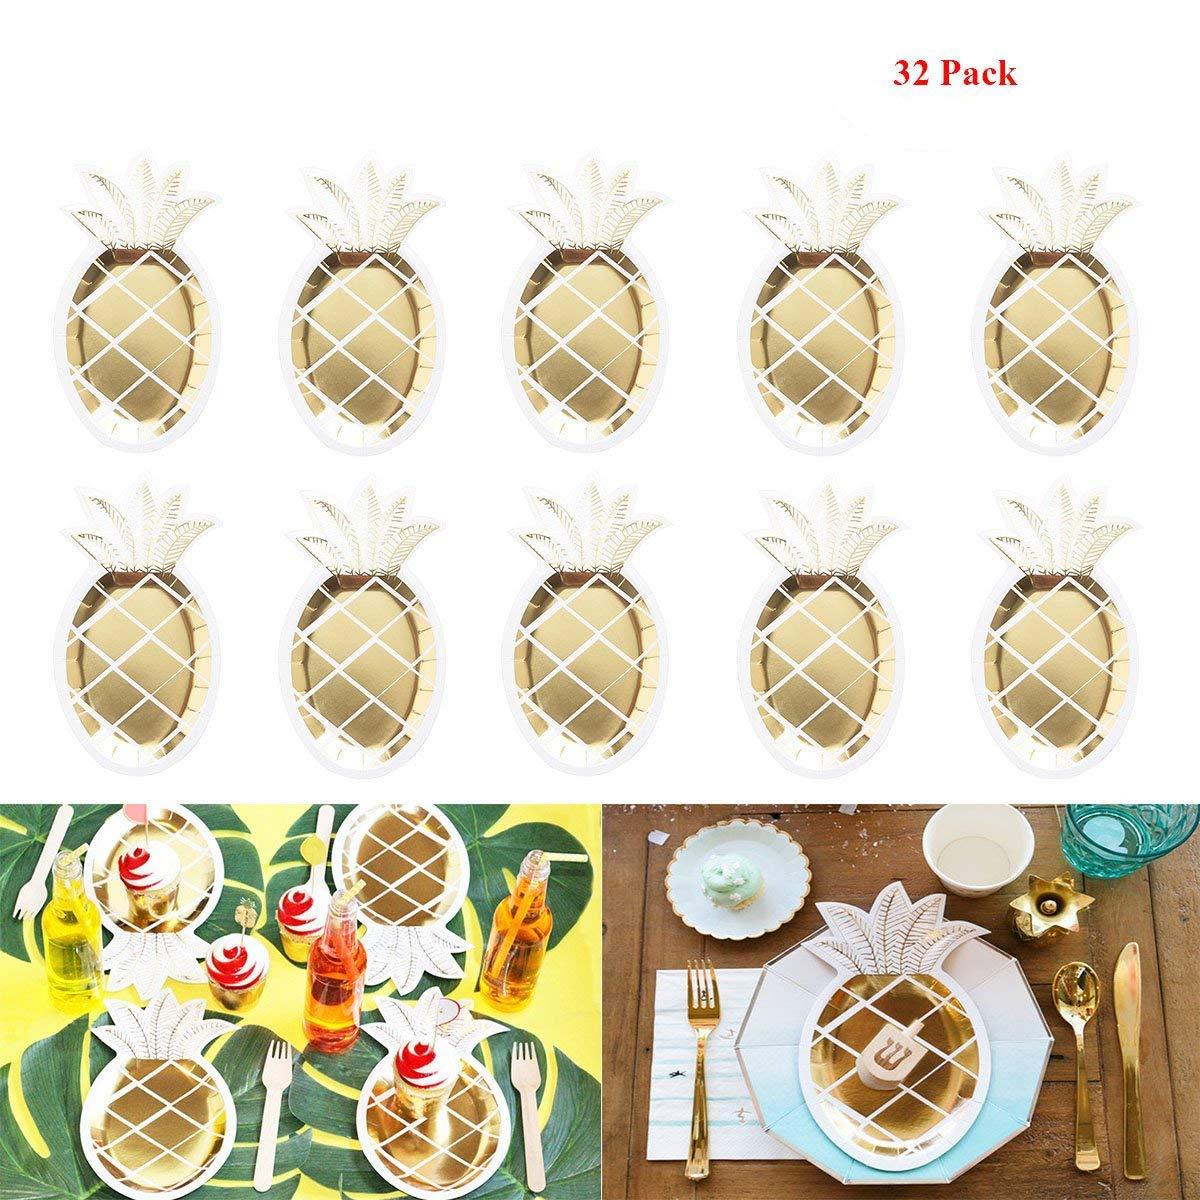 Pineapple Paper Plates - 32 PCS Gold Foil Pineapple Paper Plates Disposable Plates Tableware Set for Luau Hawaiian Birthday Party Supplies